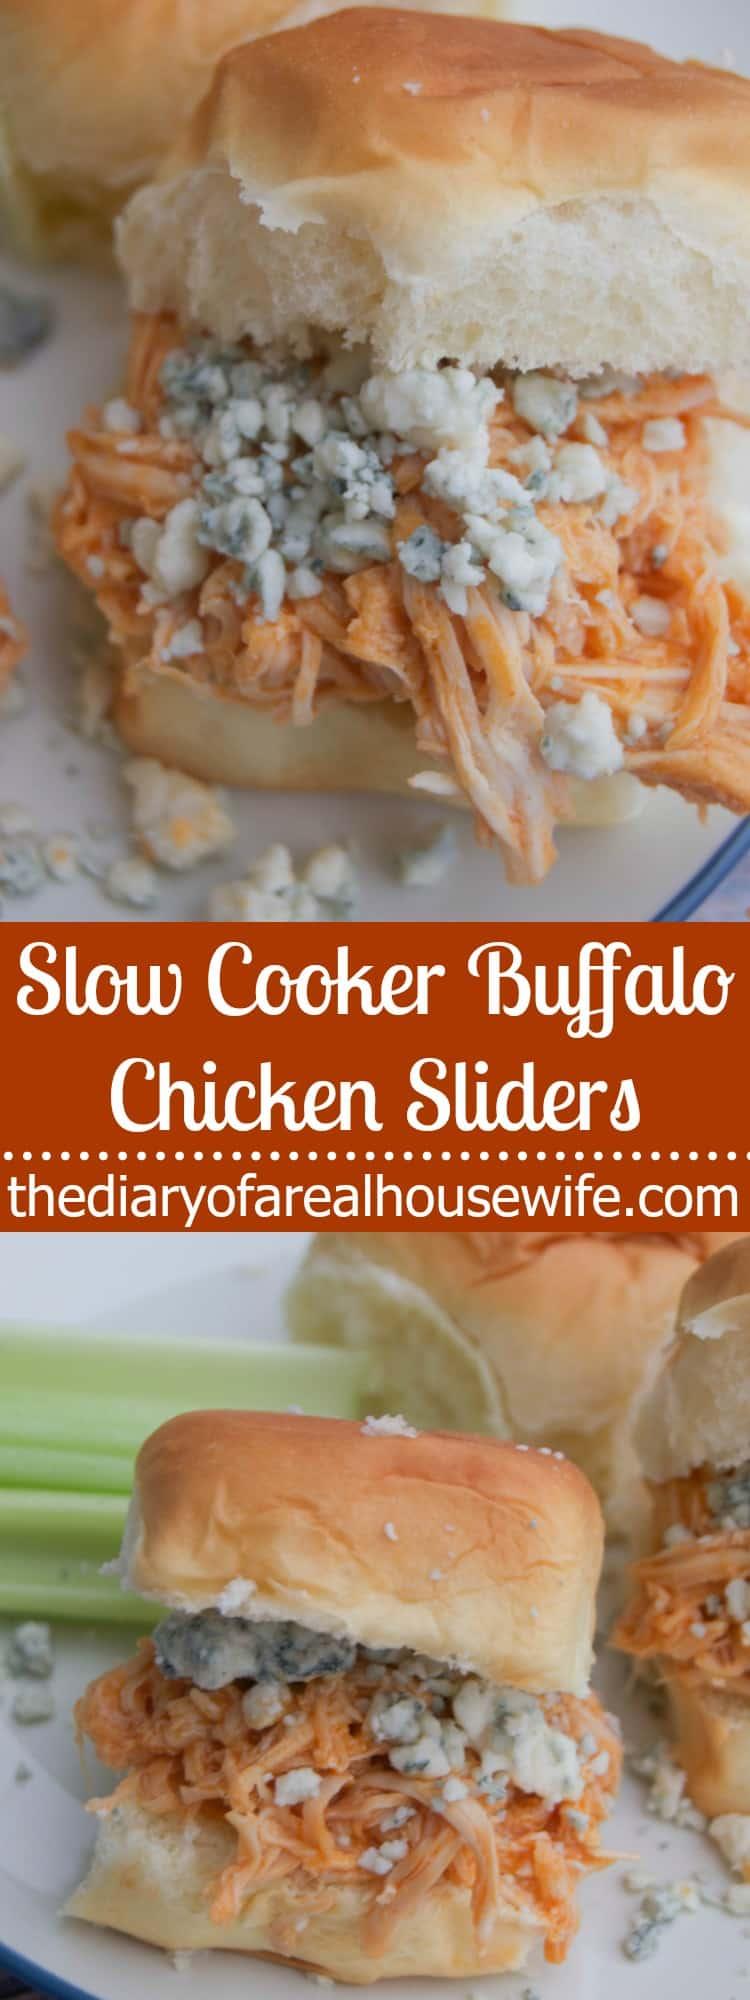 Slow Cooker Buffalo Chicken Sliders